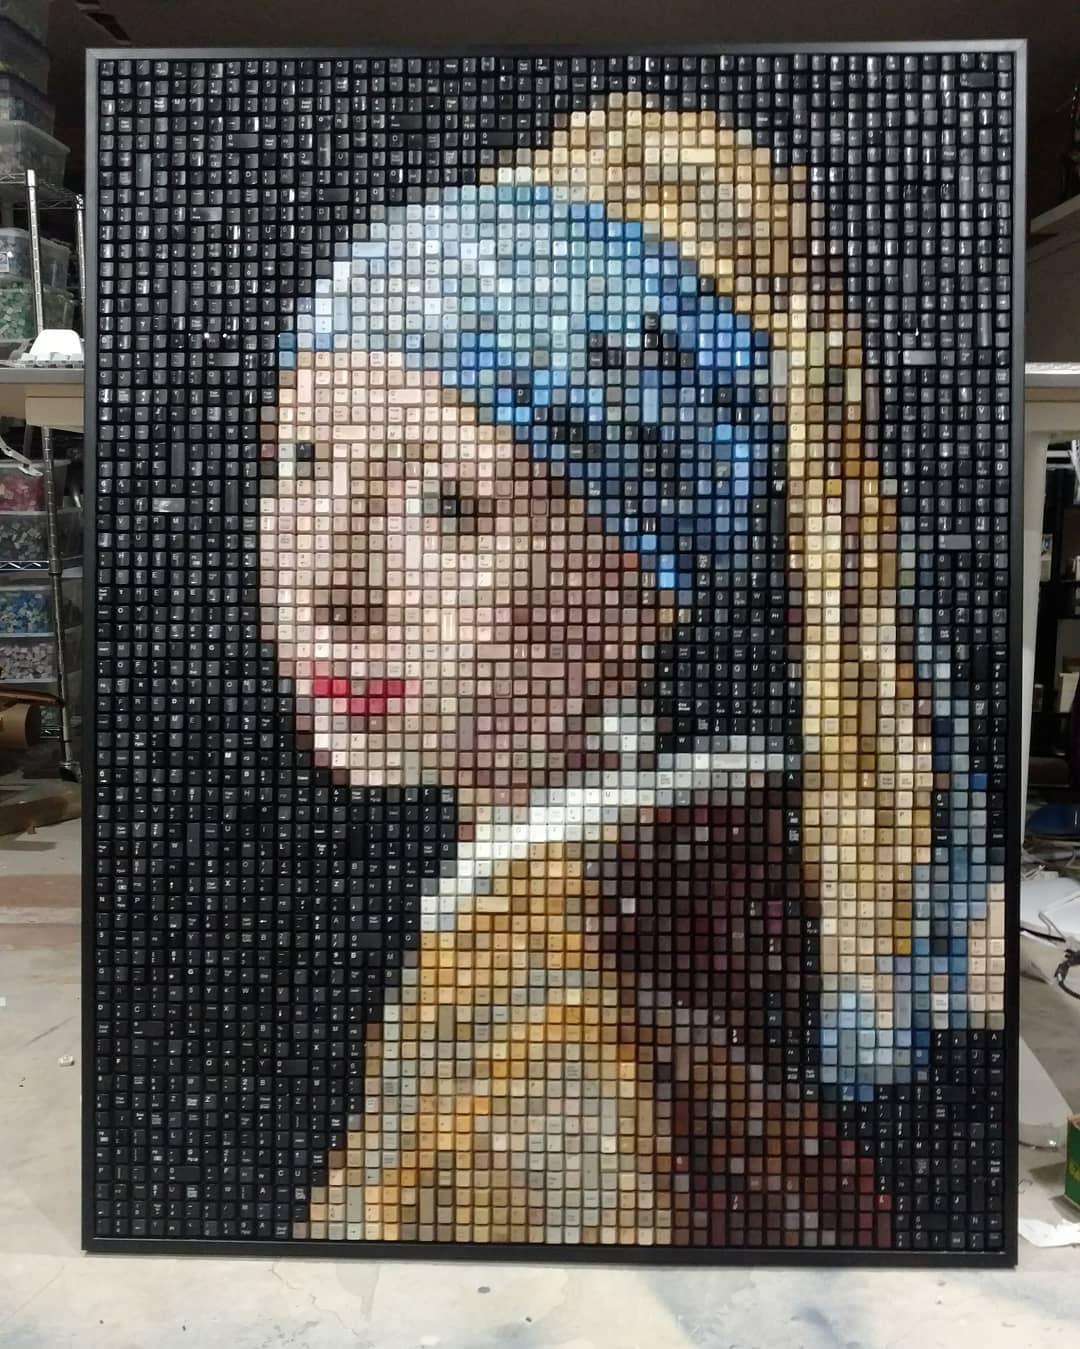 Este artista convierte teclados usados en obras de arte famosas